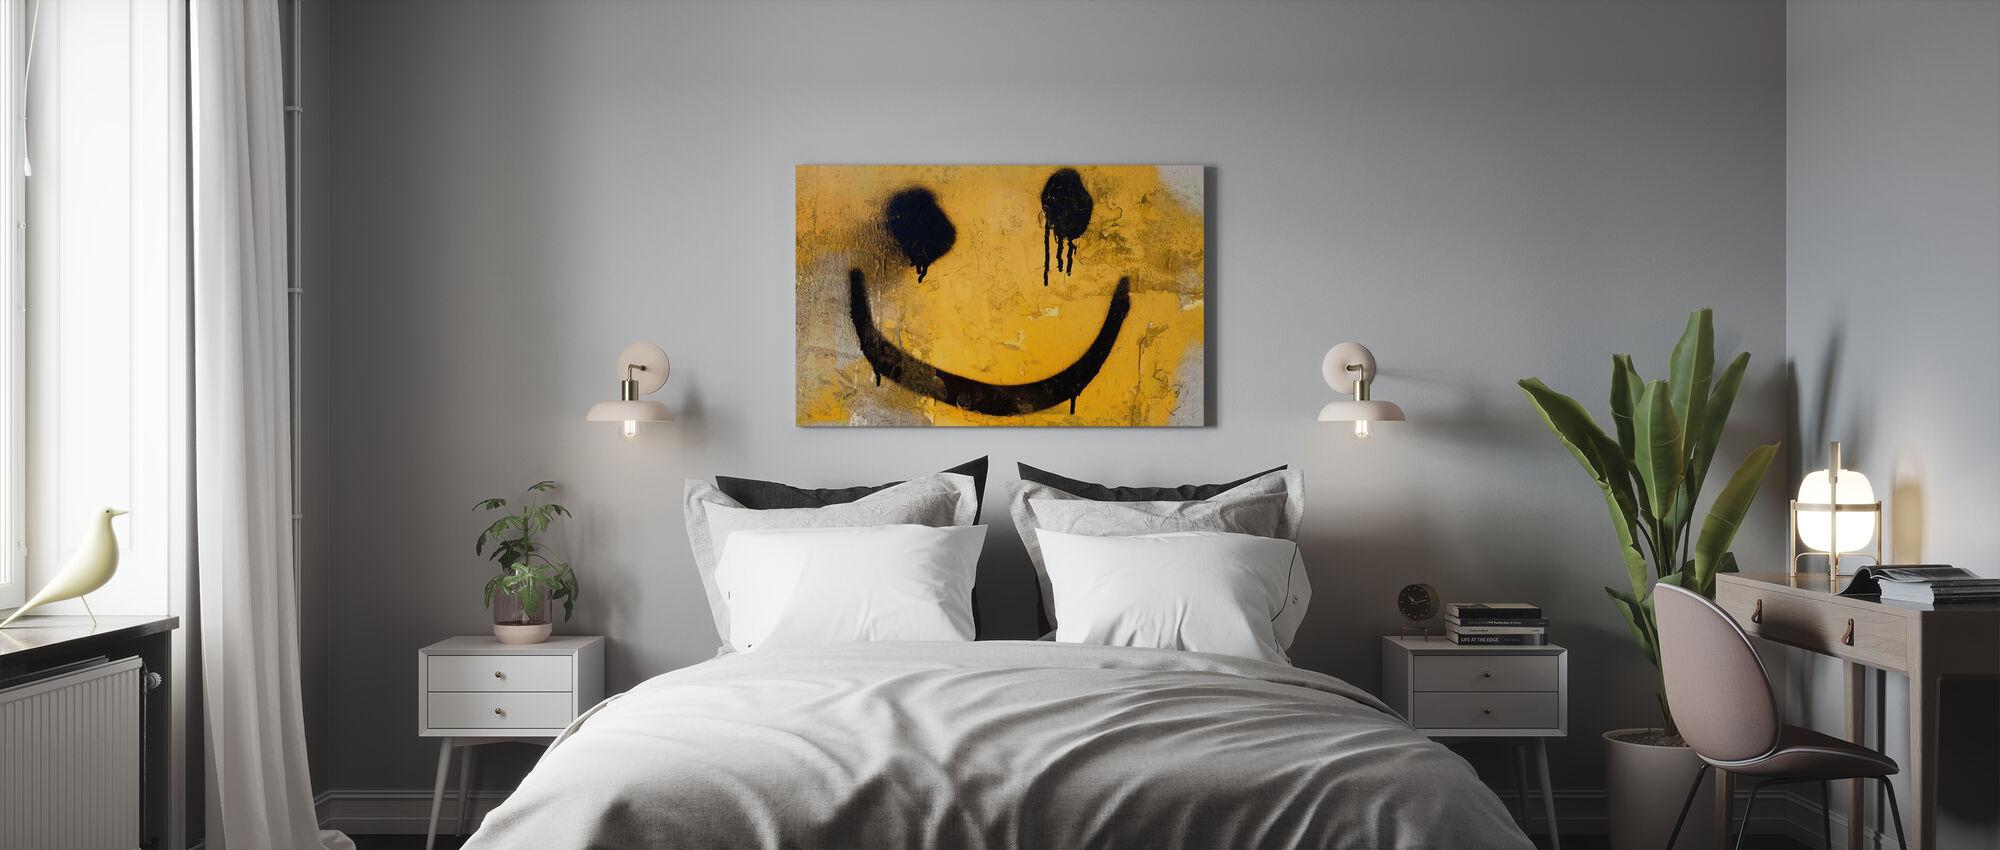 Smiley Face - Canvas print - Bedroom